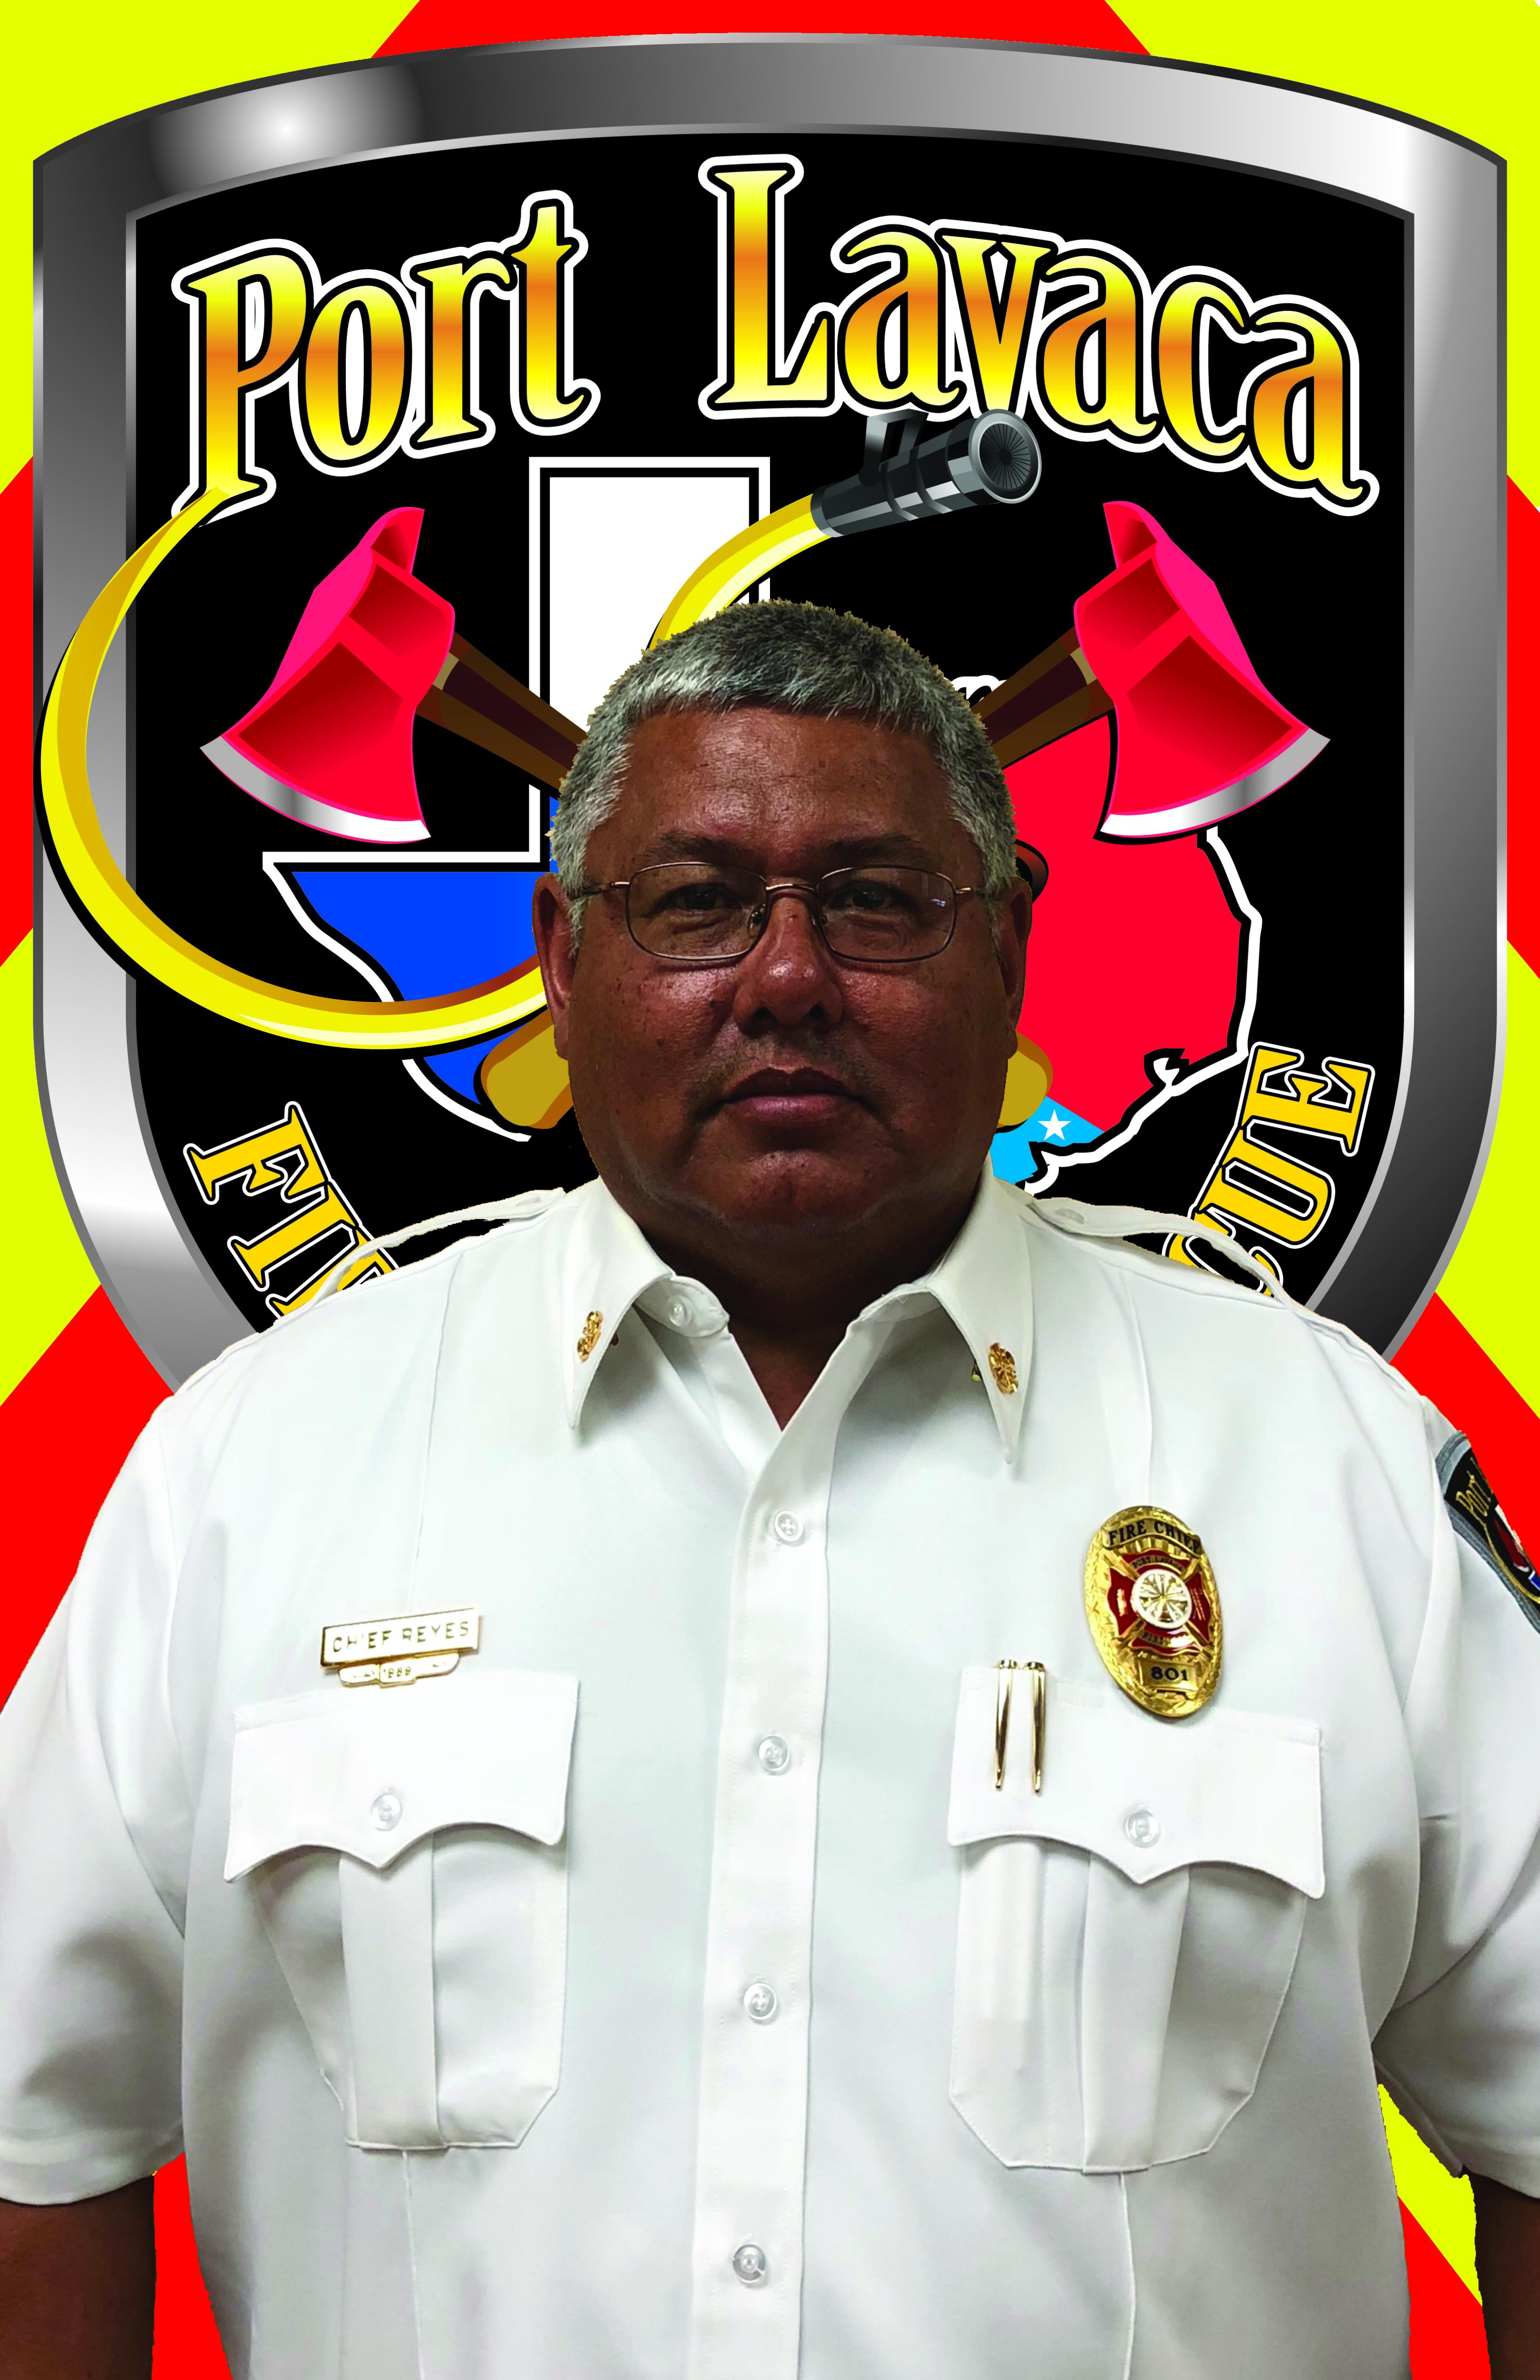 Chief Reyes